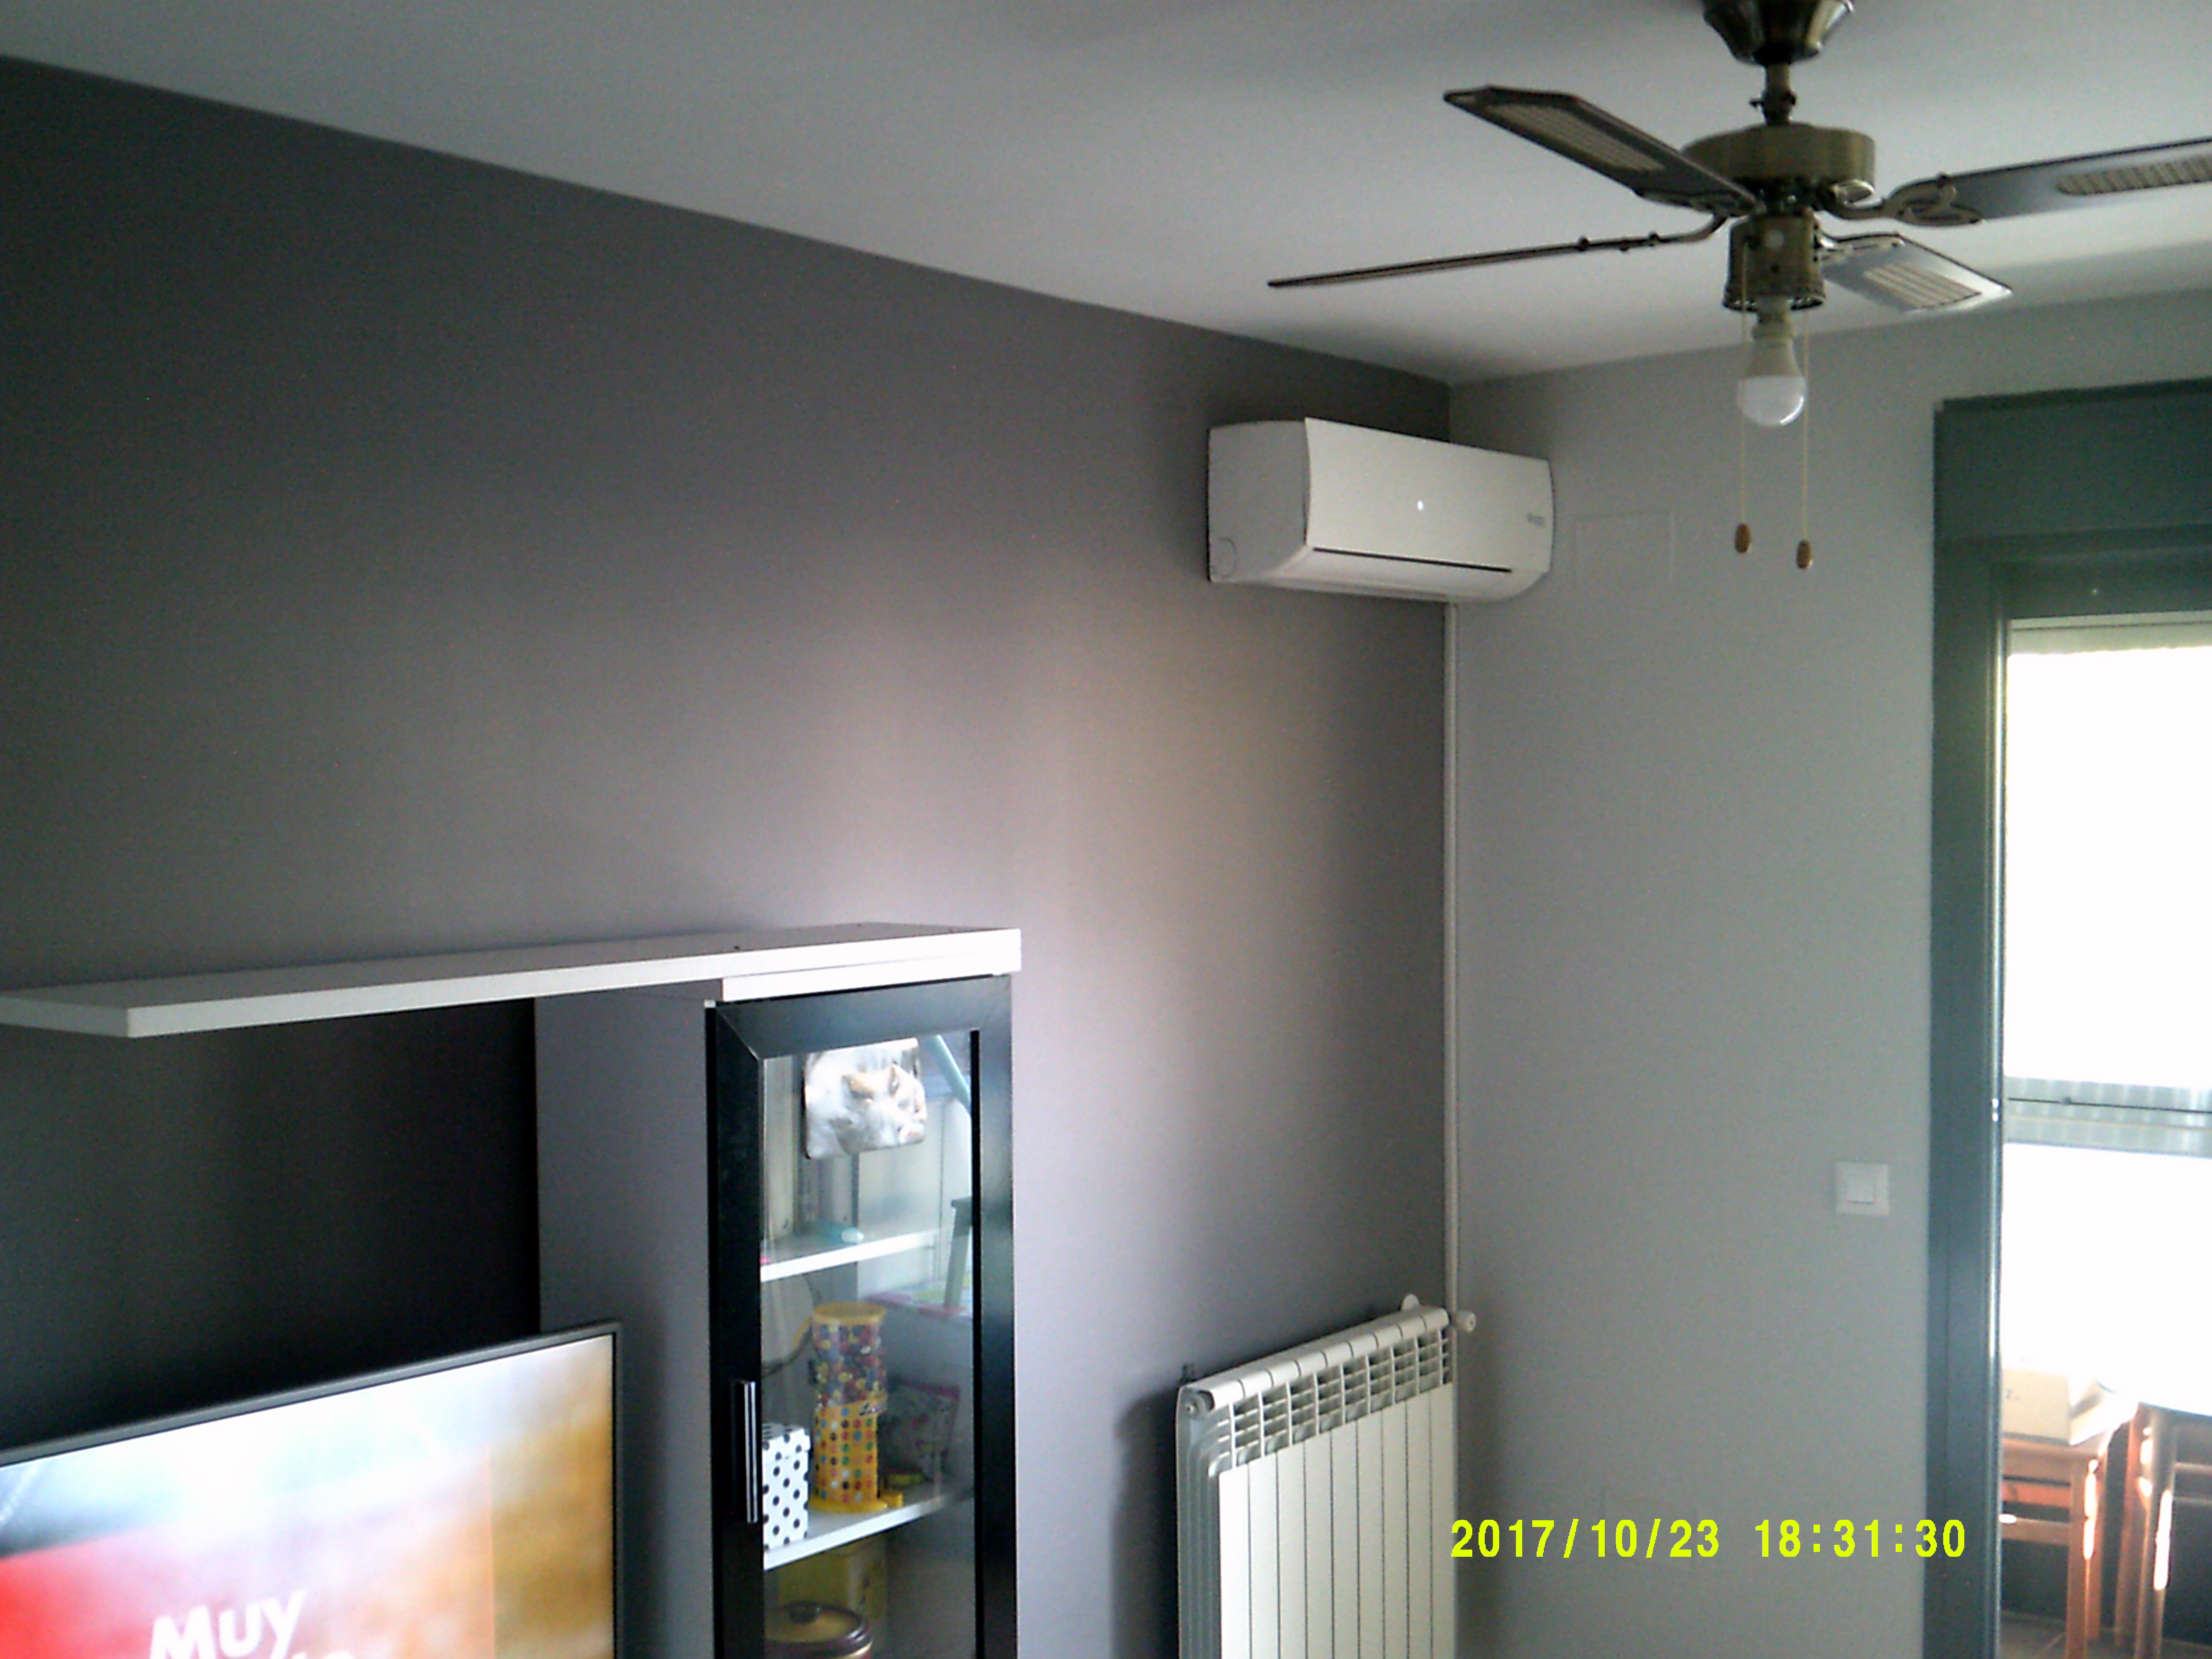 Color gris perla para paredes trendy decoracin gris de la - Color gris perla para paredes ...